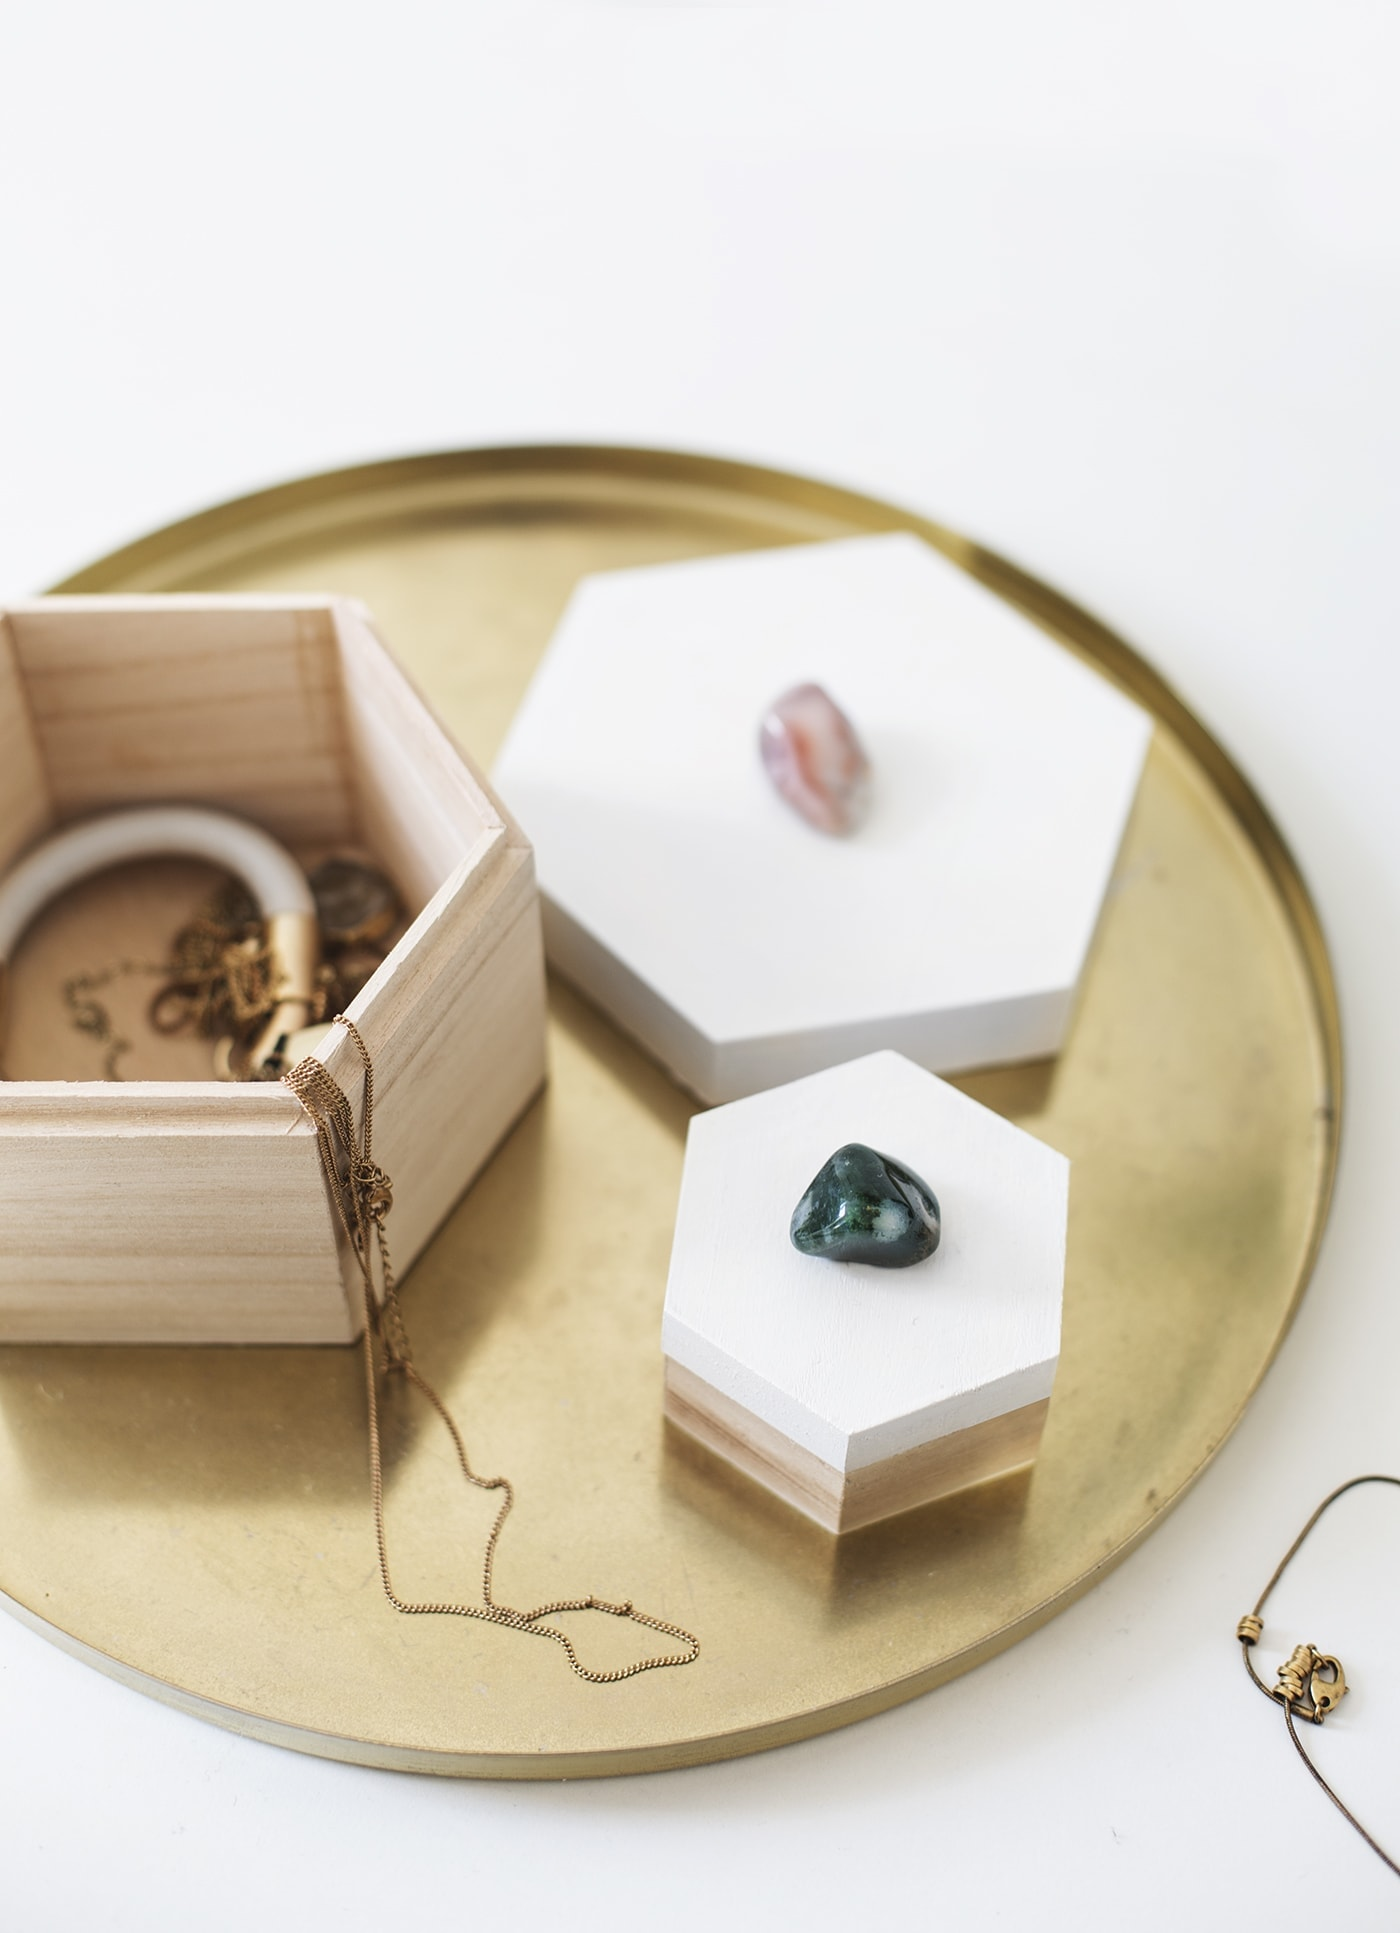 diy-gem-pull-box-storage-home-craft-tutorial